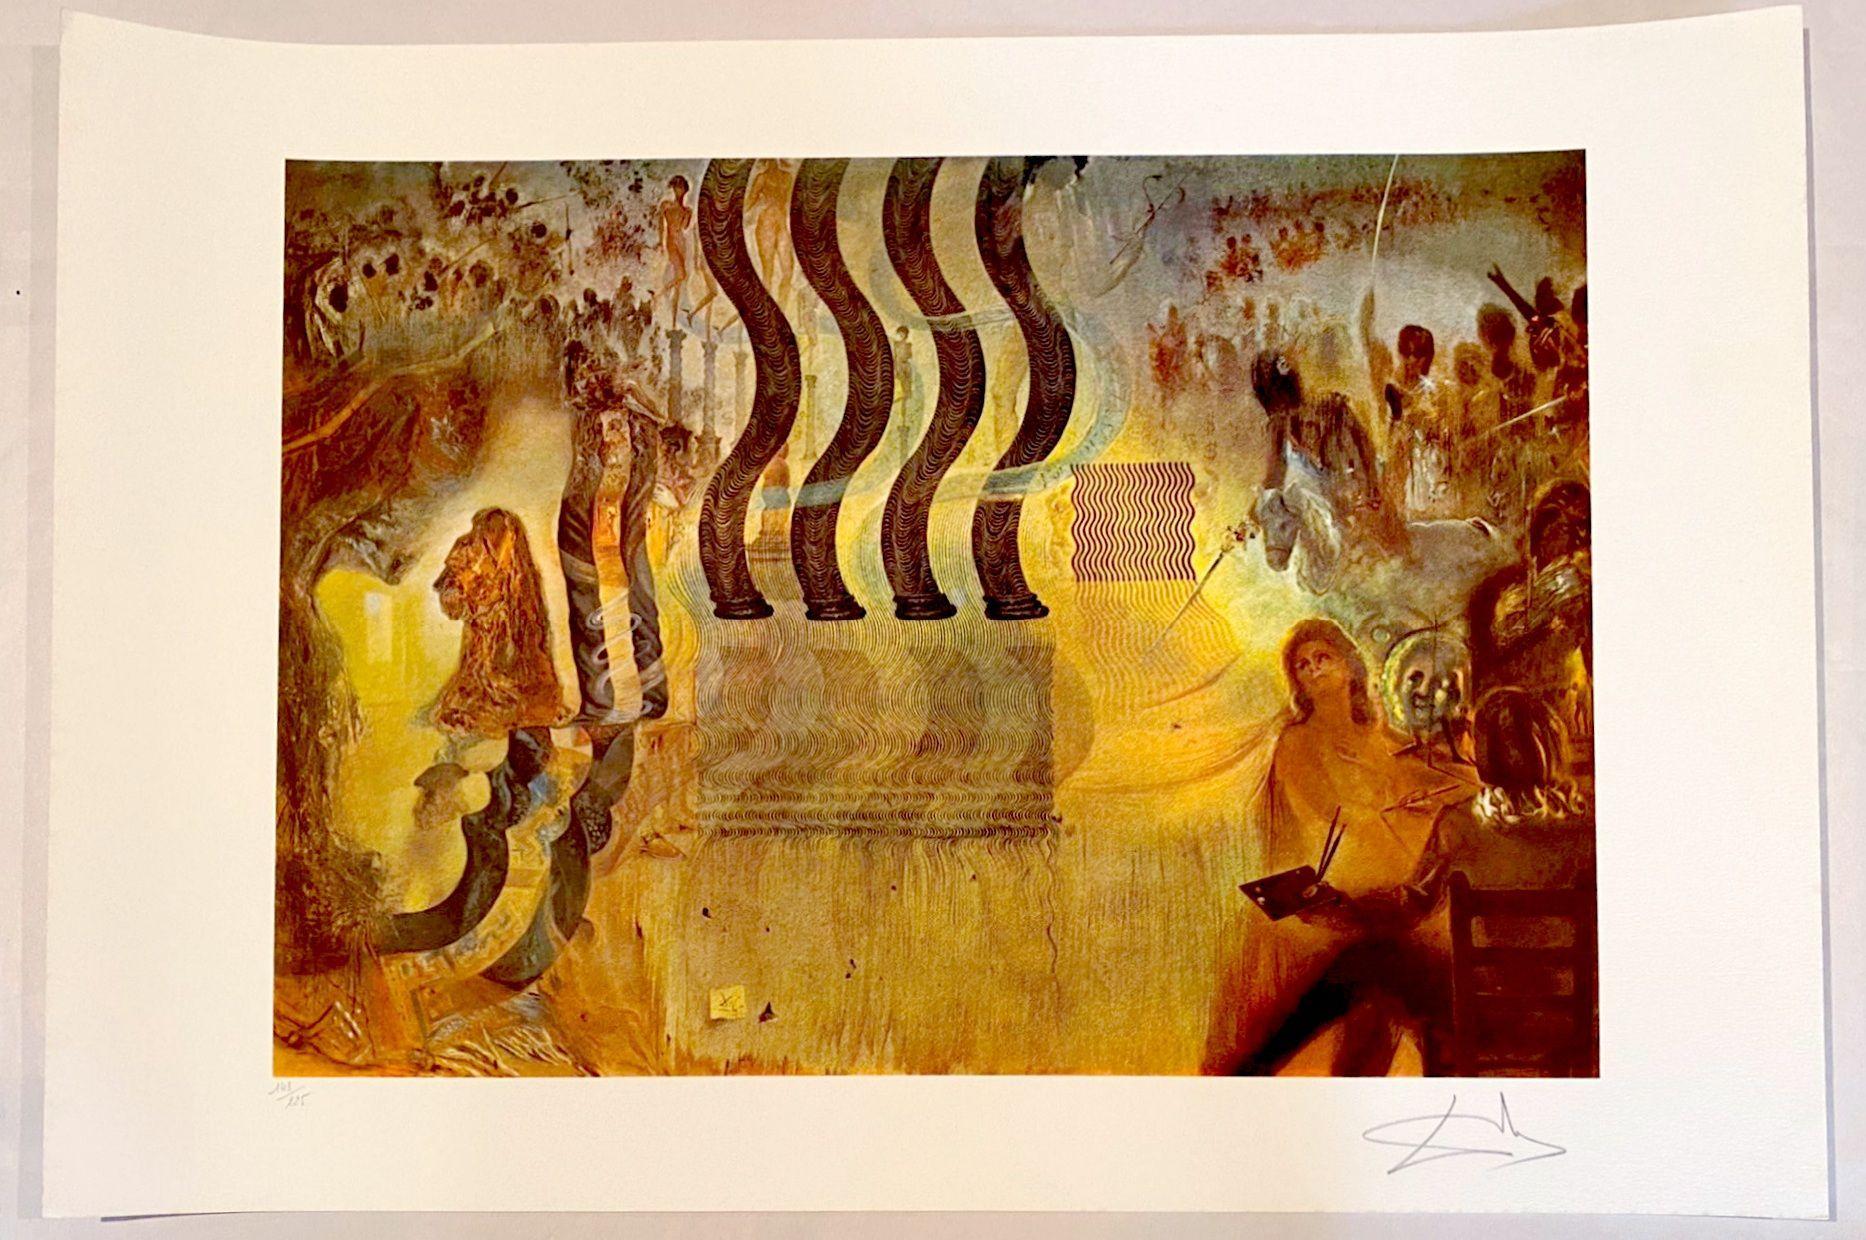 Salvador Dalí - L'Apothéose du dollar